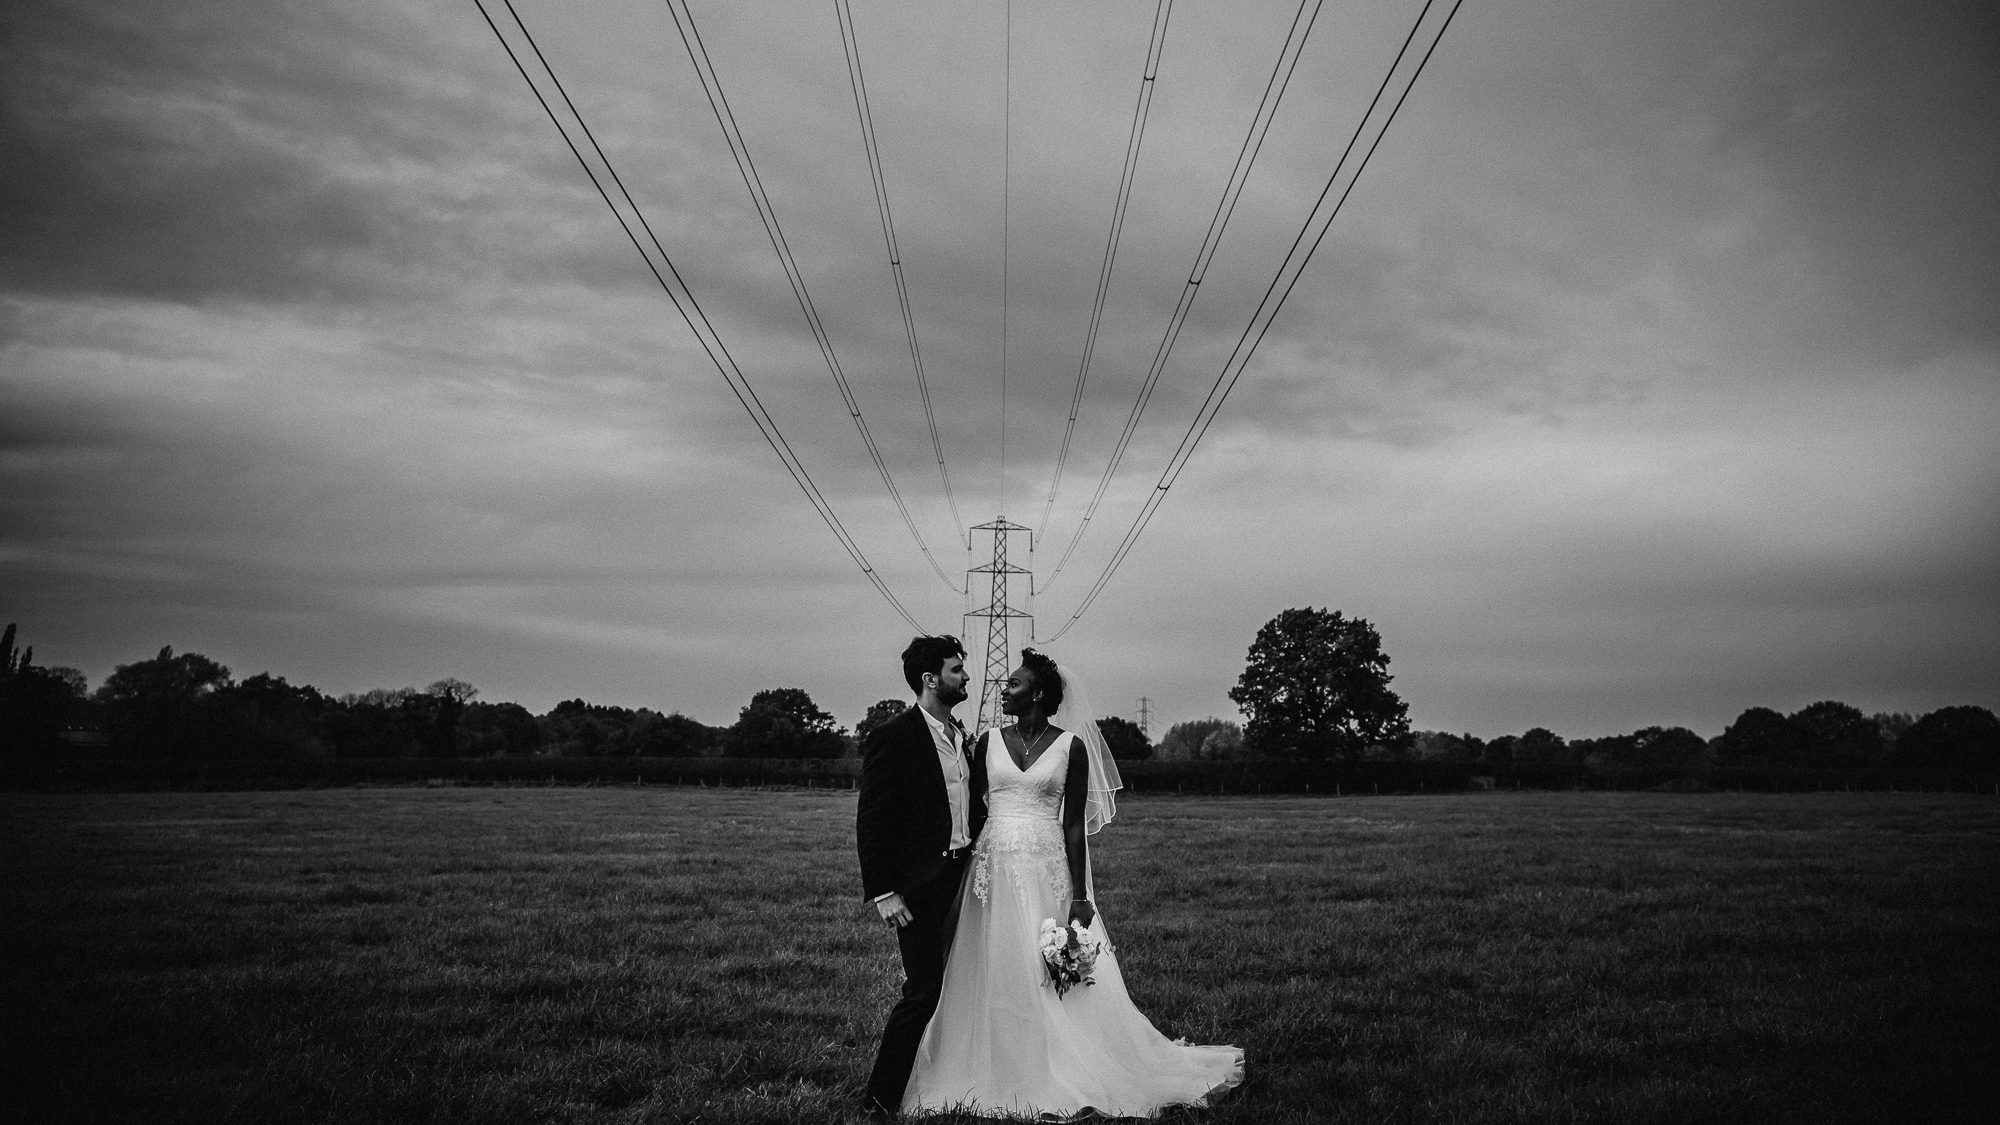 Owen HOuse Wedding Barn WEdding Photographer cheshire adam joe roberts photography (29 of 36).jpg